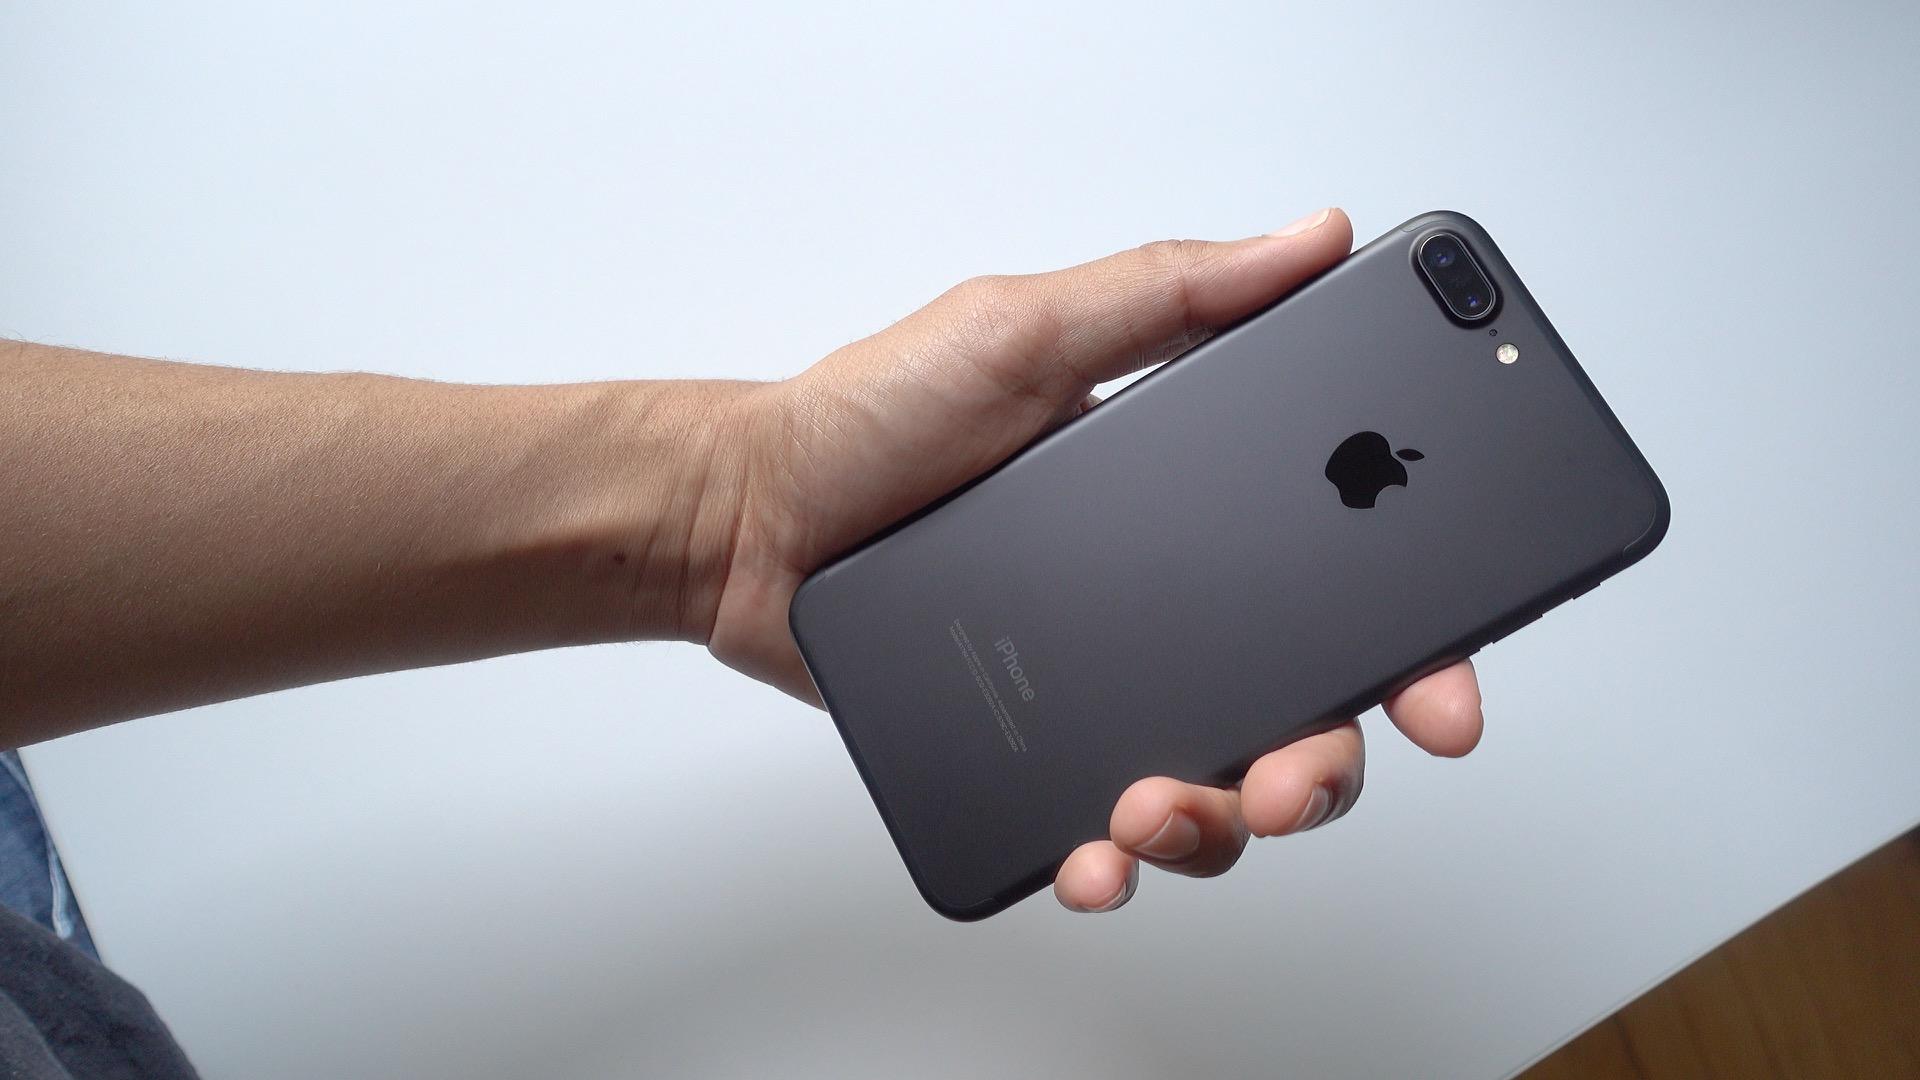 iphone 7 plus silver vs black